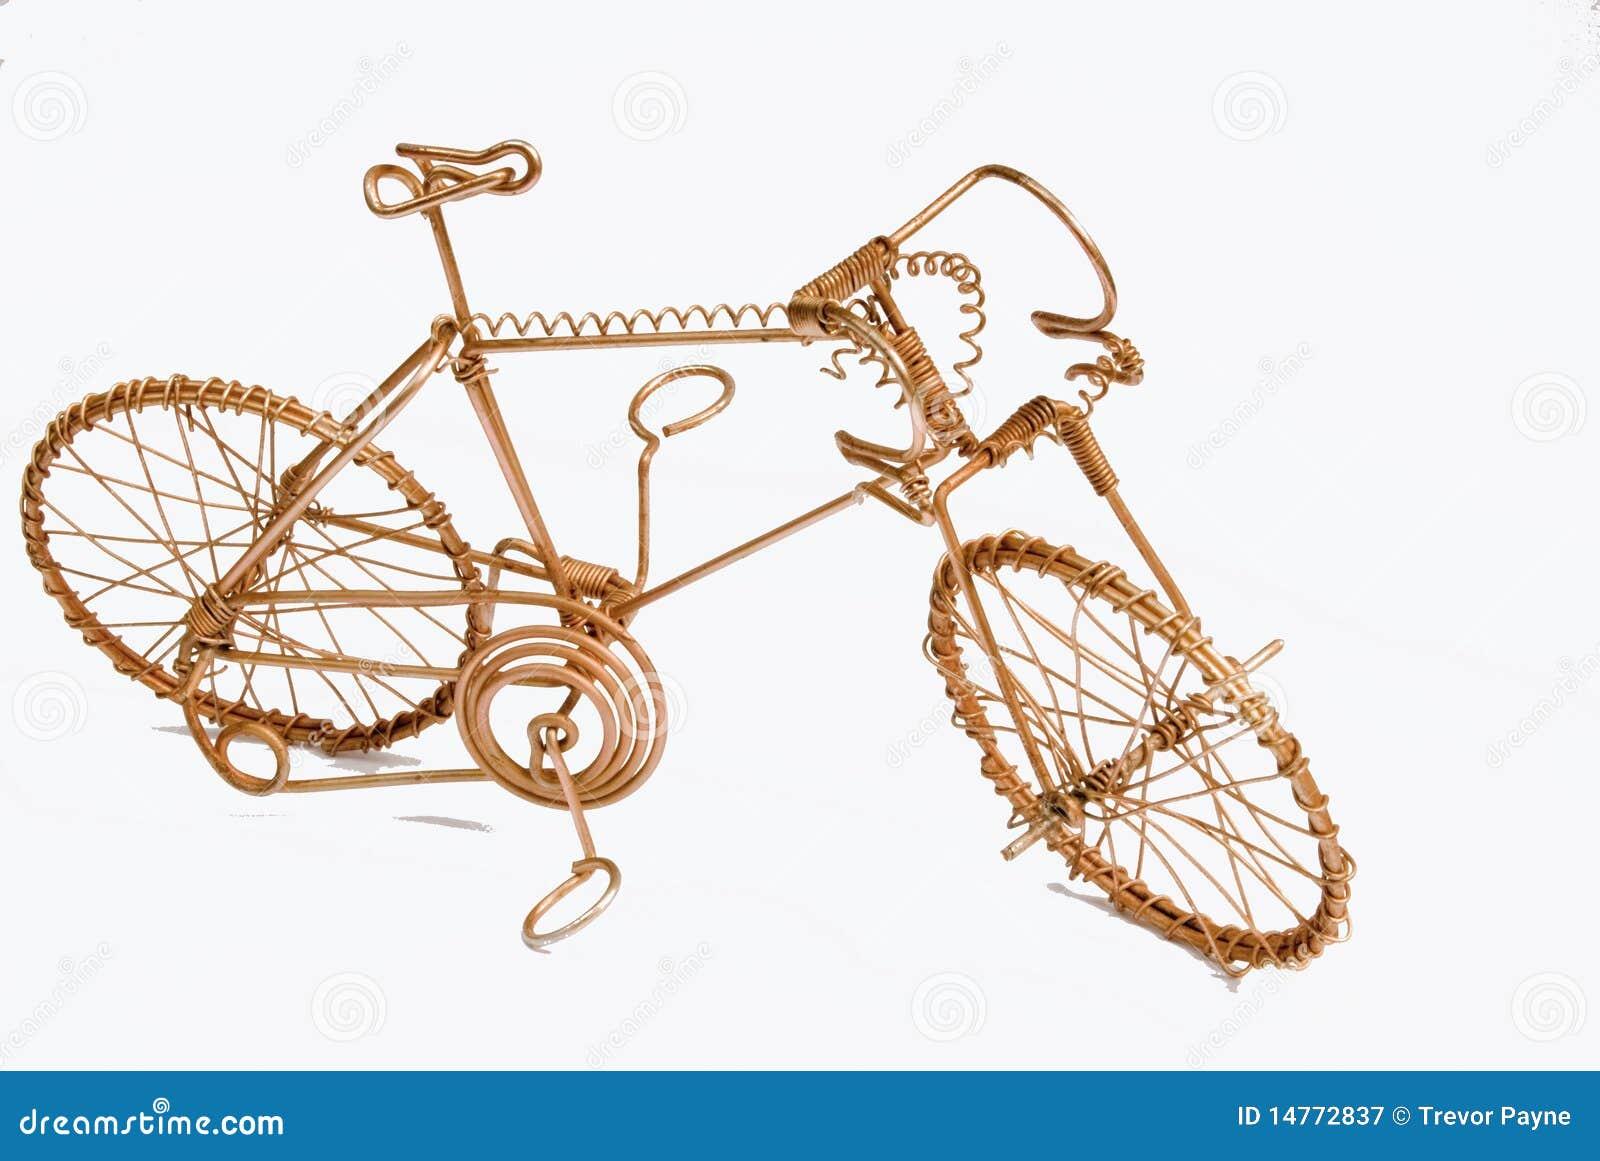 Draht-Kunst-Fahrrad stockbild. Bild von fertigkeiten - 14772837